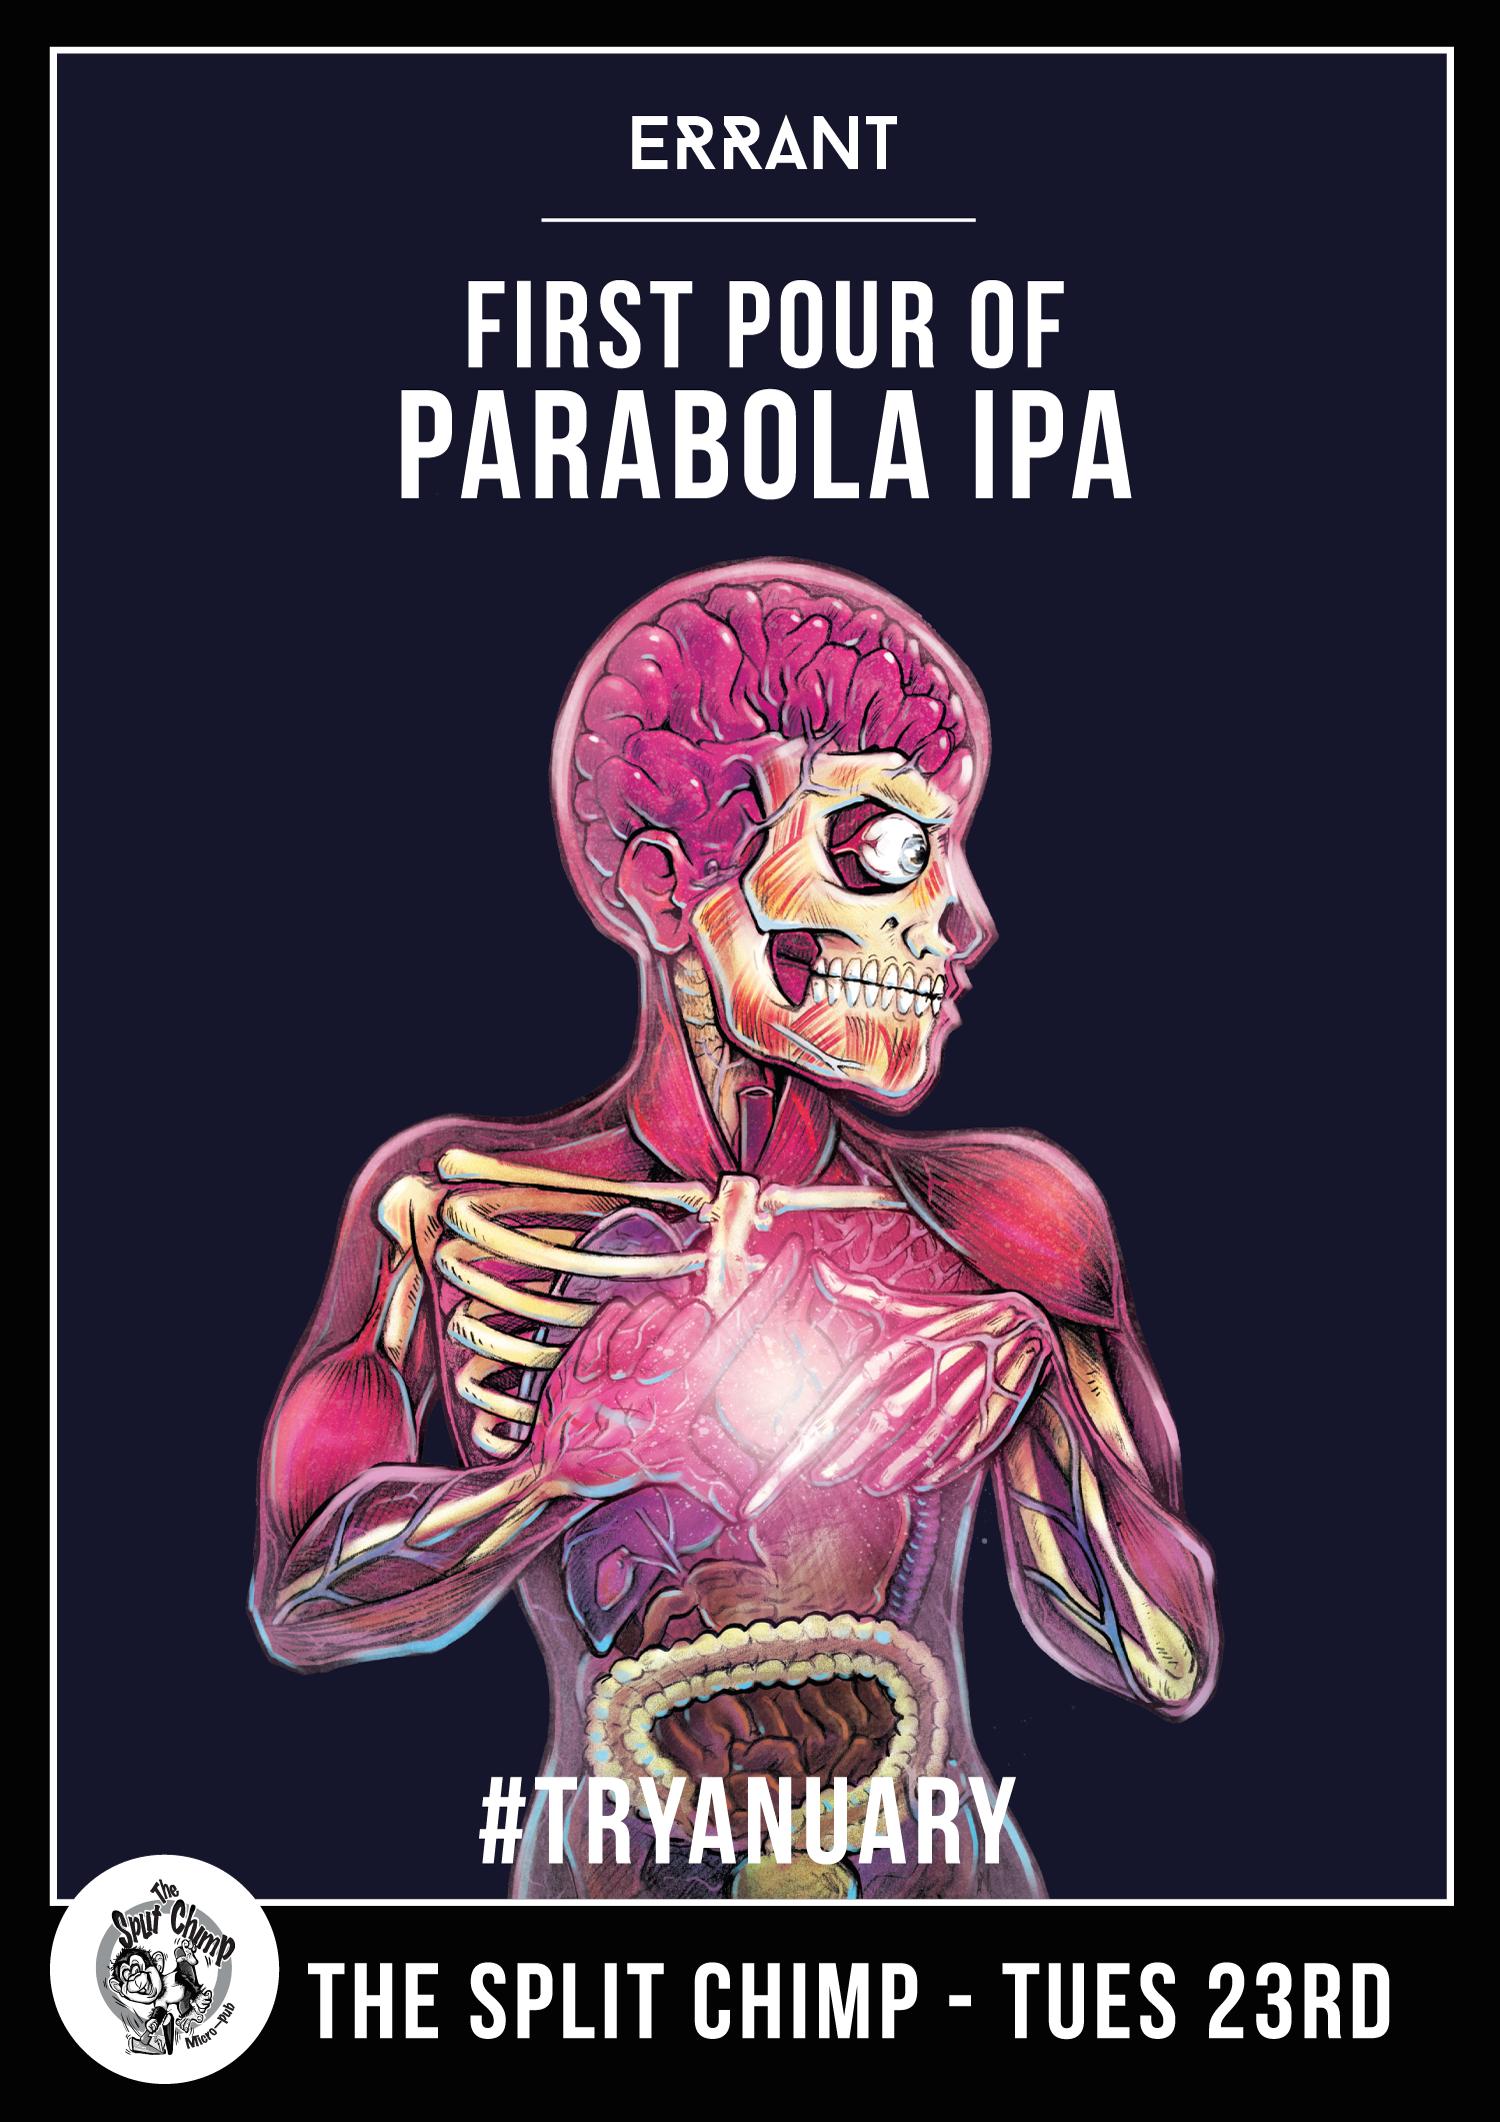 Errant-Poster-PARABOLA-for-web.png